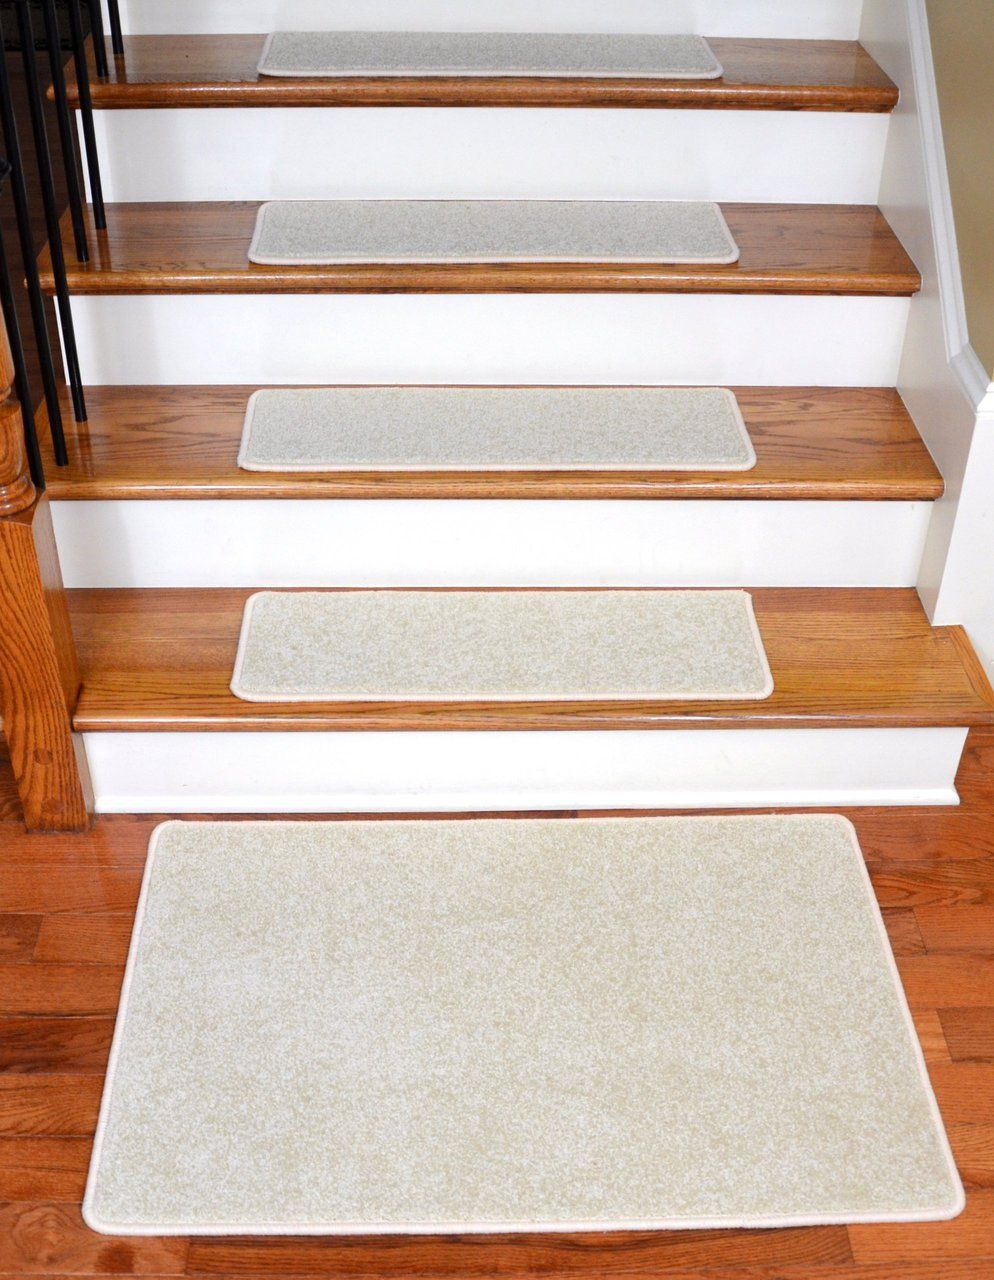 Best Dean Carpet Stair Treads 27 X 9 Buff Ivory Beige Plush 640 x 480